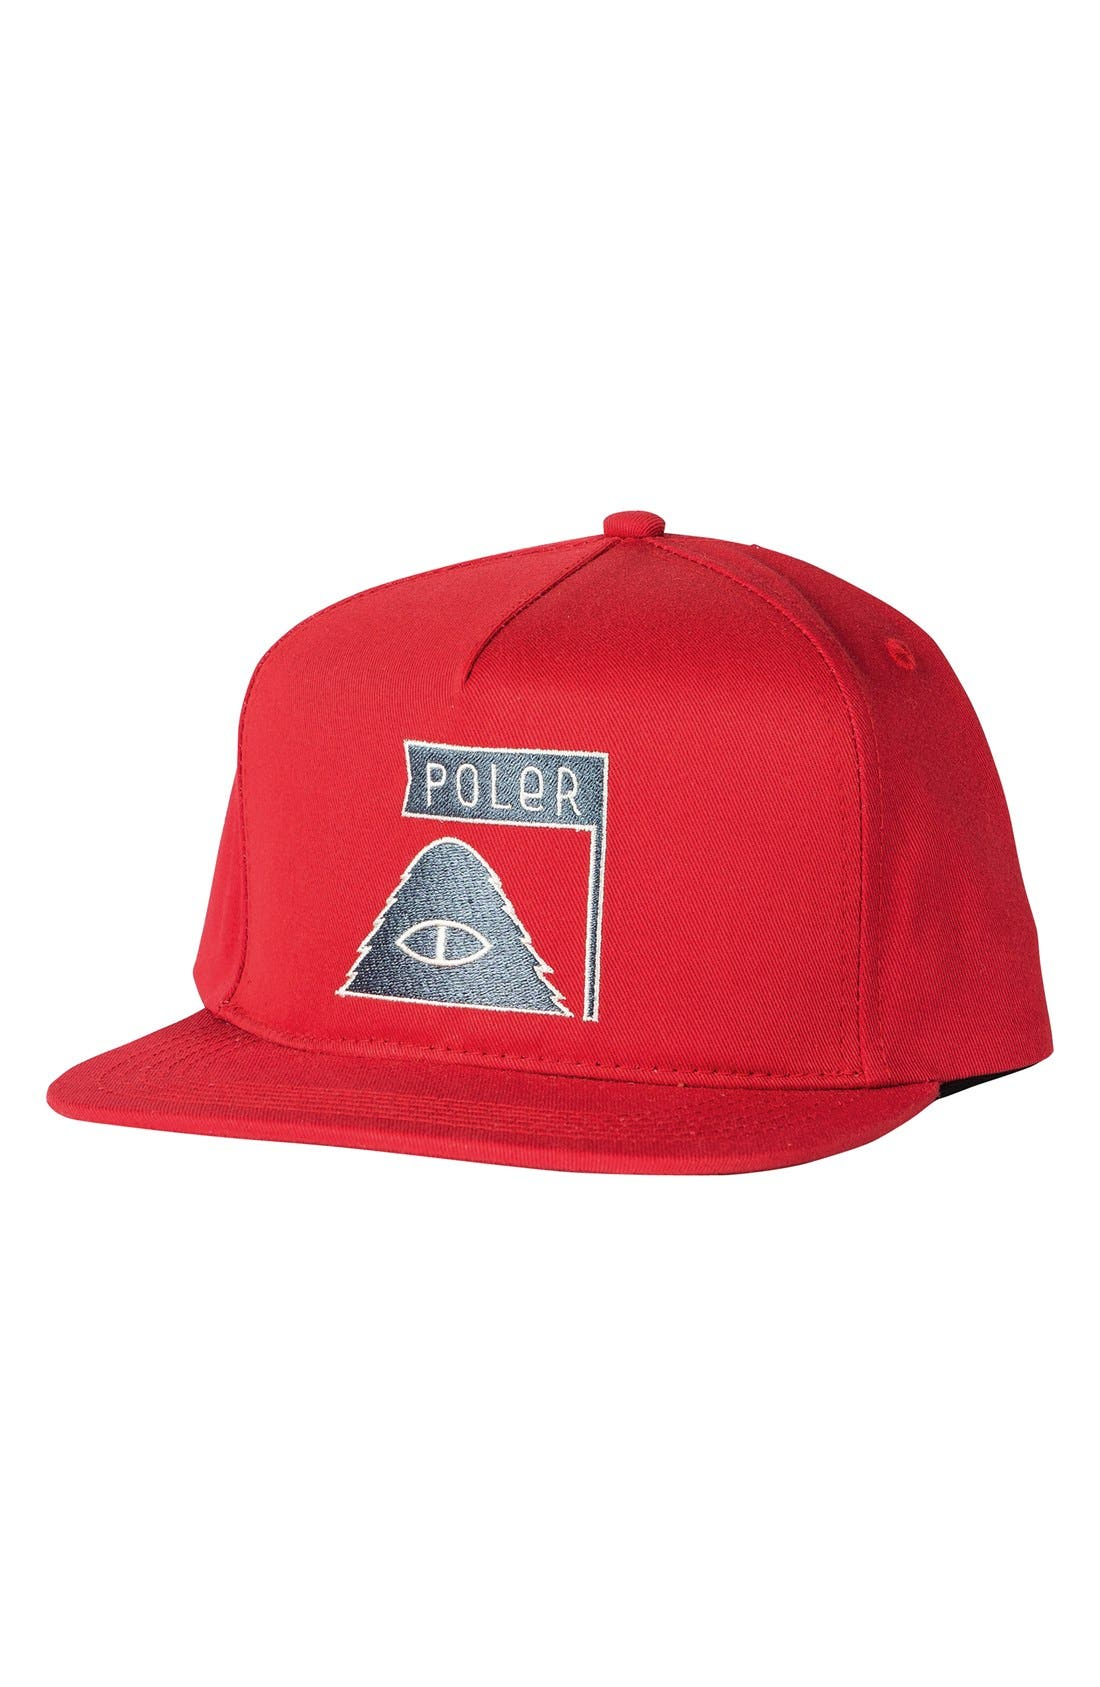 Main Image - Poler Stuff 'Cyclops' Snapback Cap